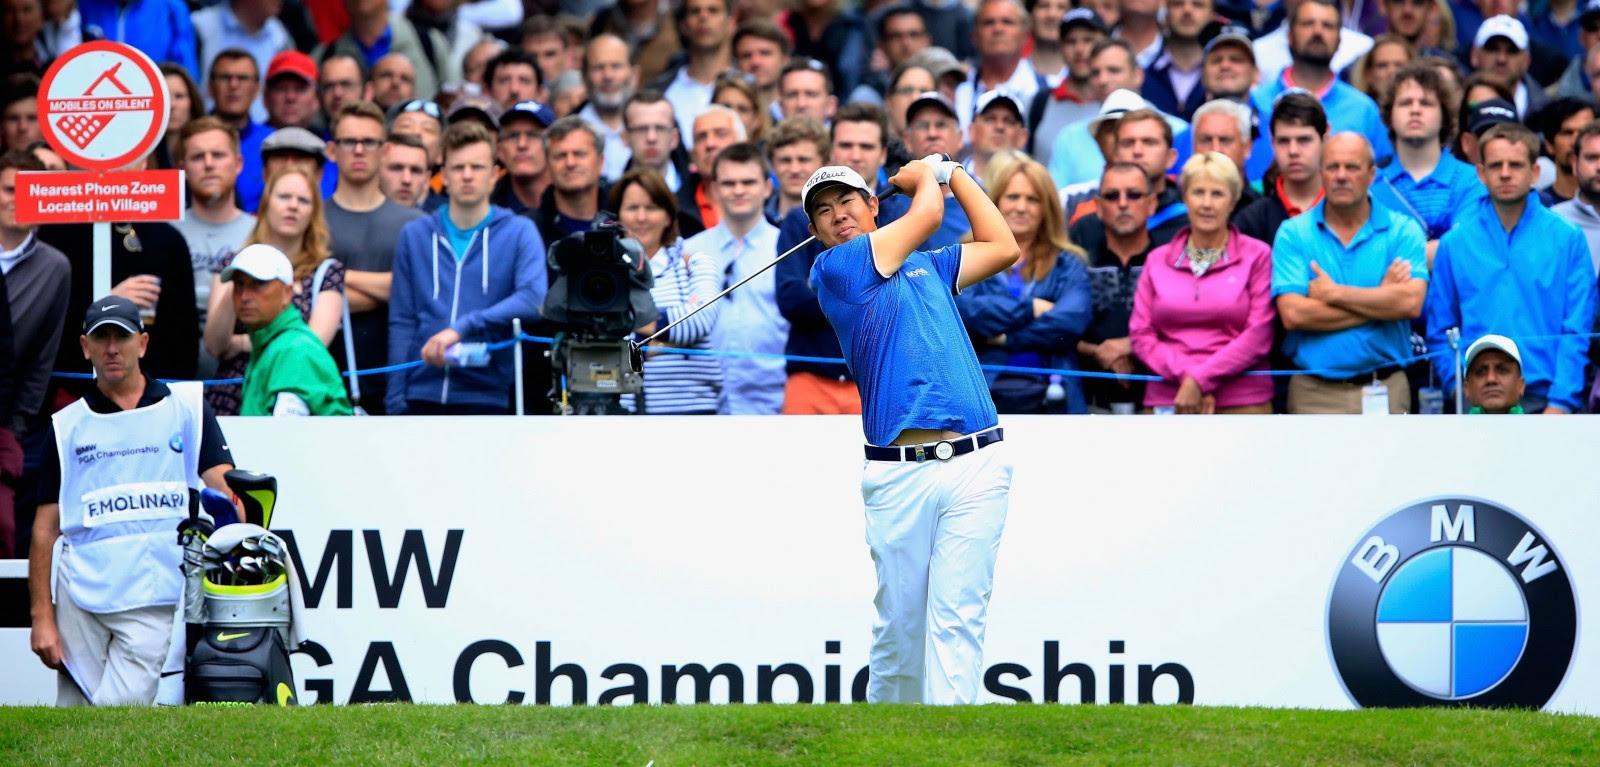 BMW PGA champ An appointed Global Ambassador for Wentworth  Golf News  Golf Magazine